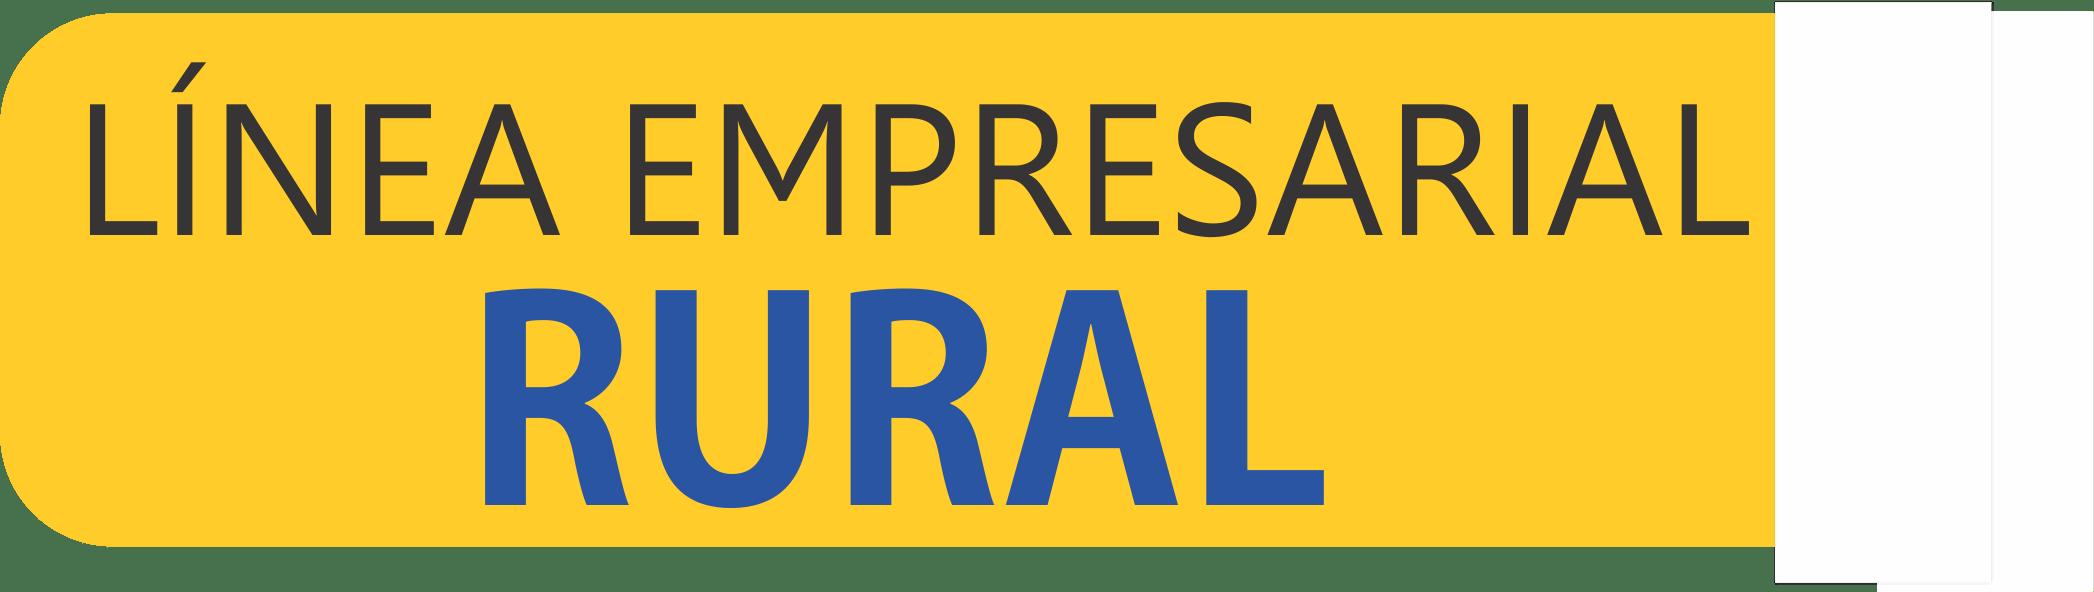 banner linea empresarial rural